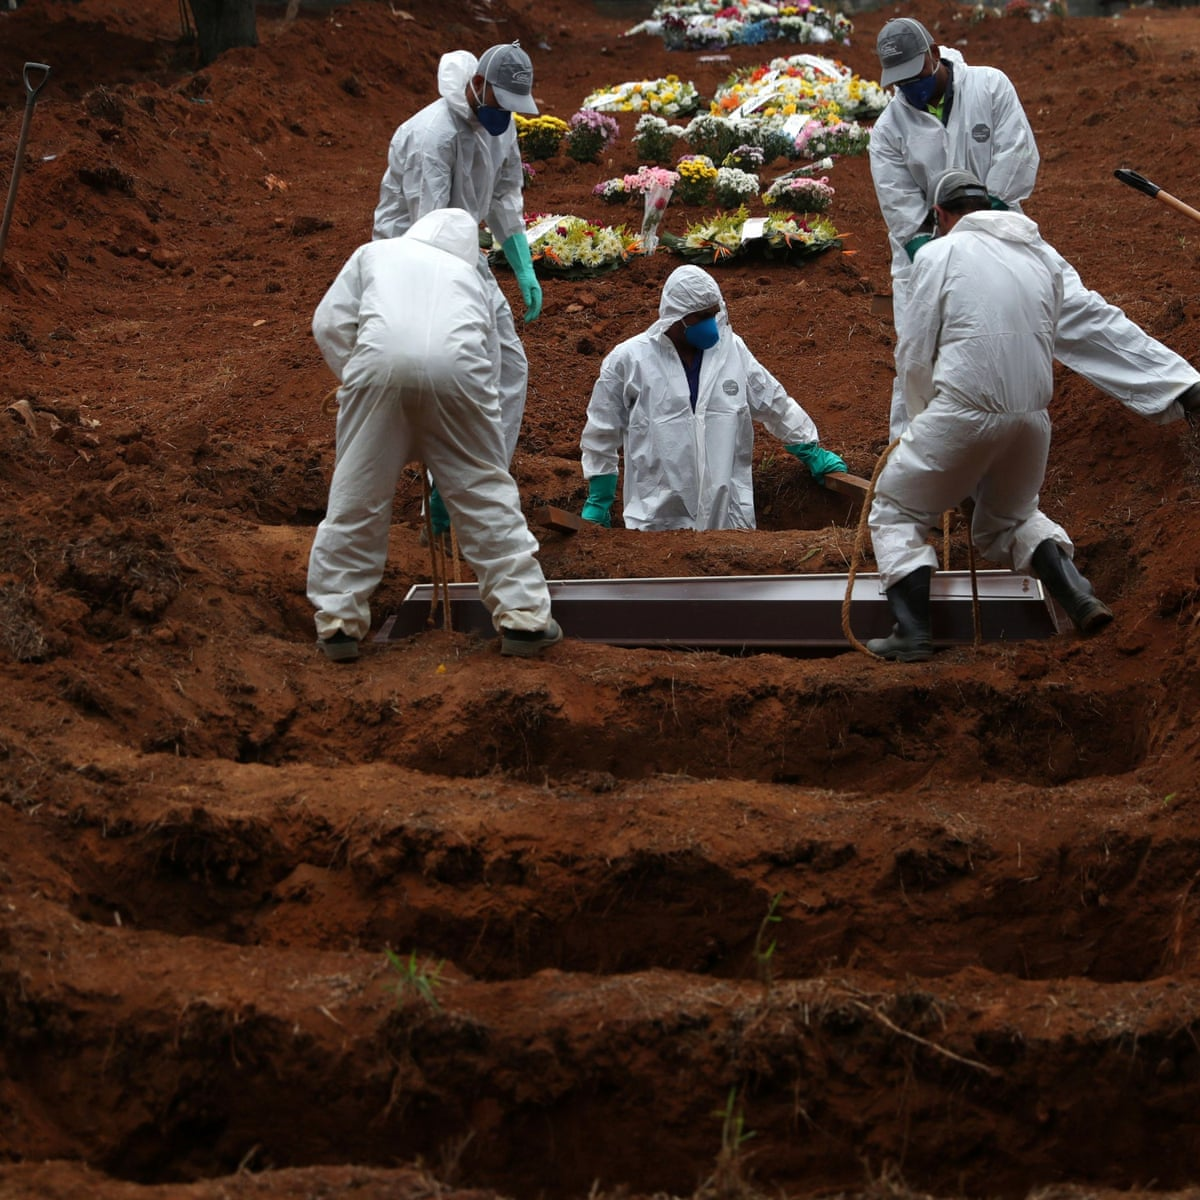 Brazil, Mexico report more COVID-19 deaths